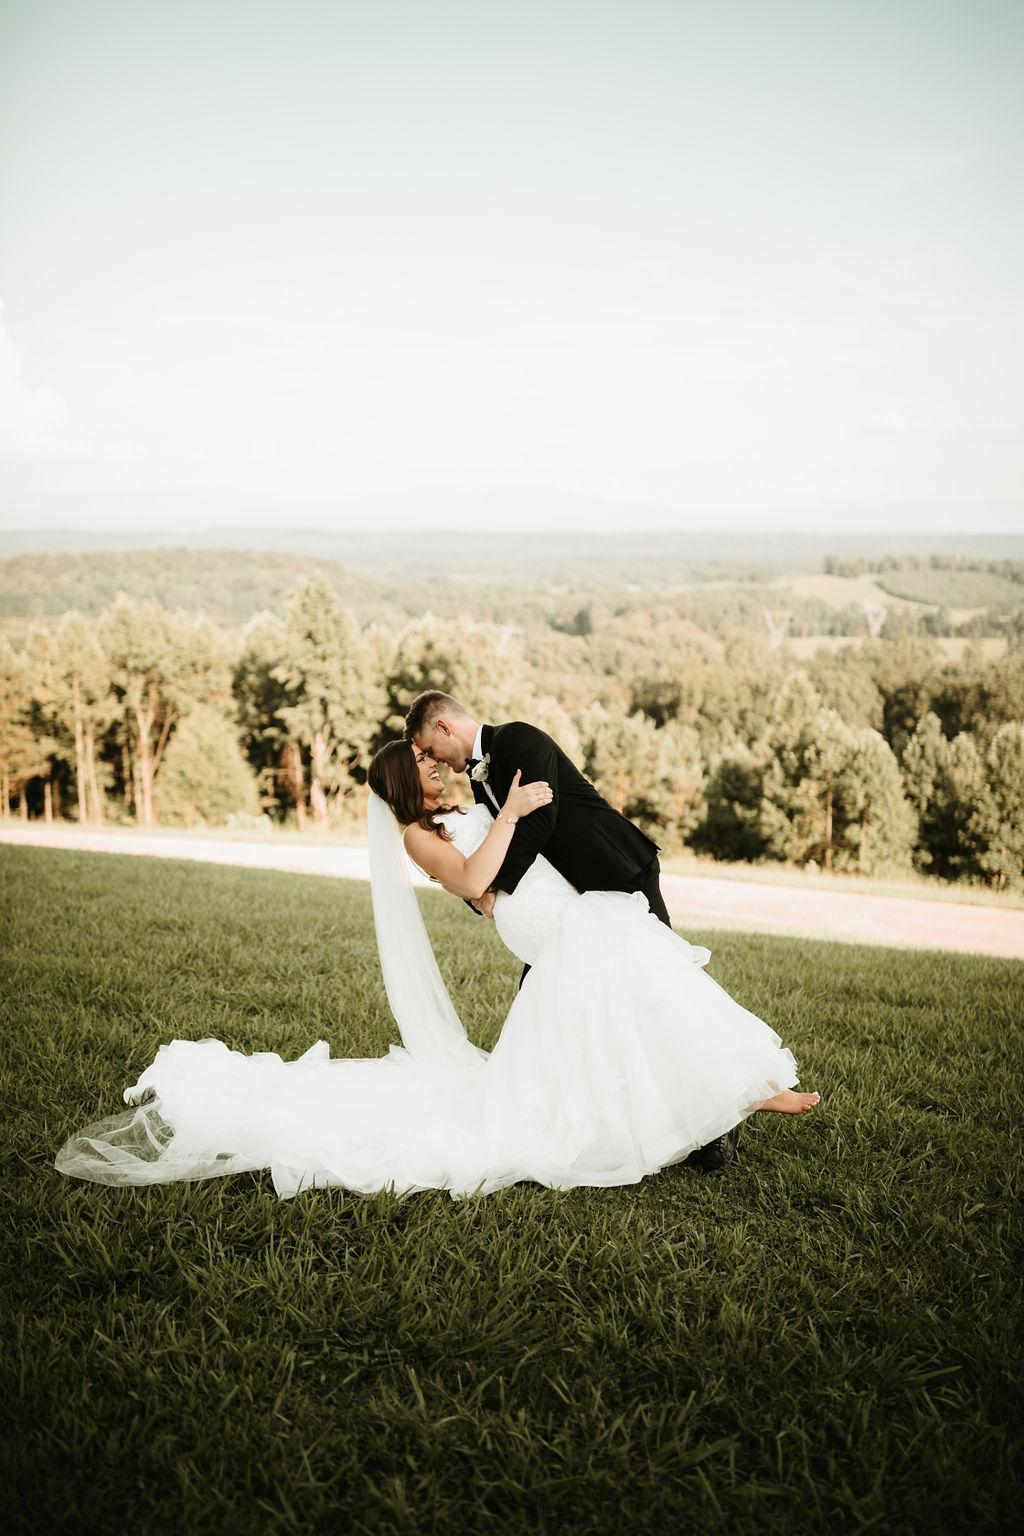 Lauren & Zach Engle - August 4, 2018Savanna Kaye Photography